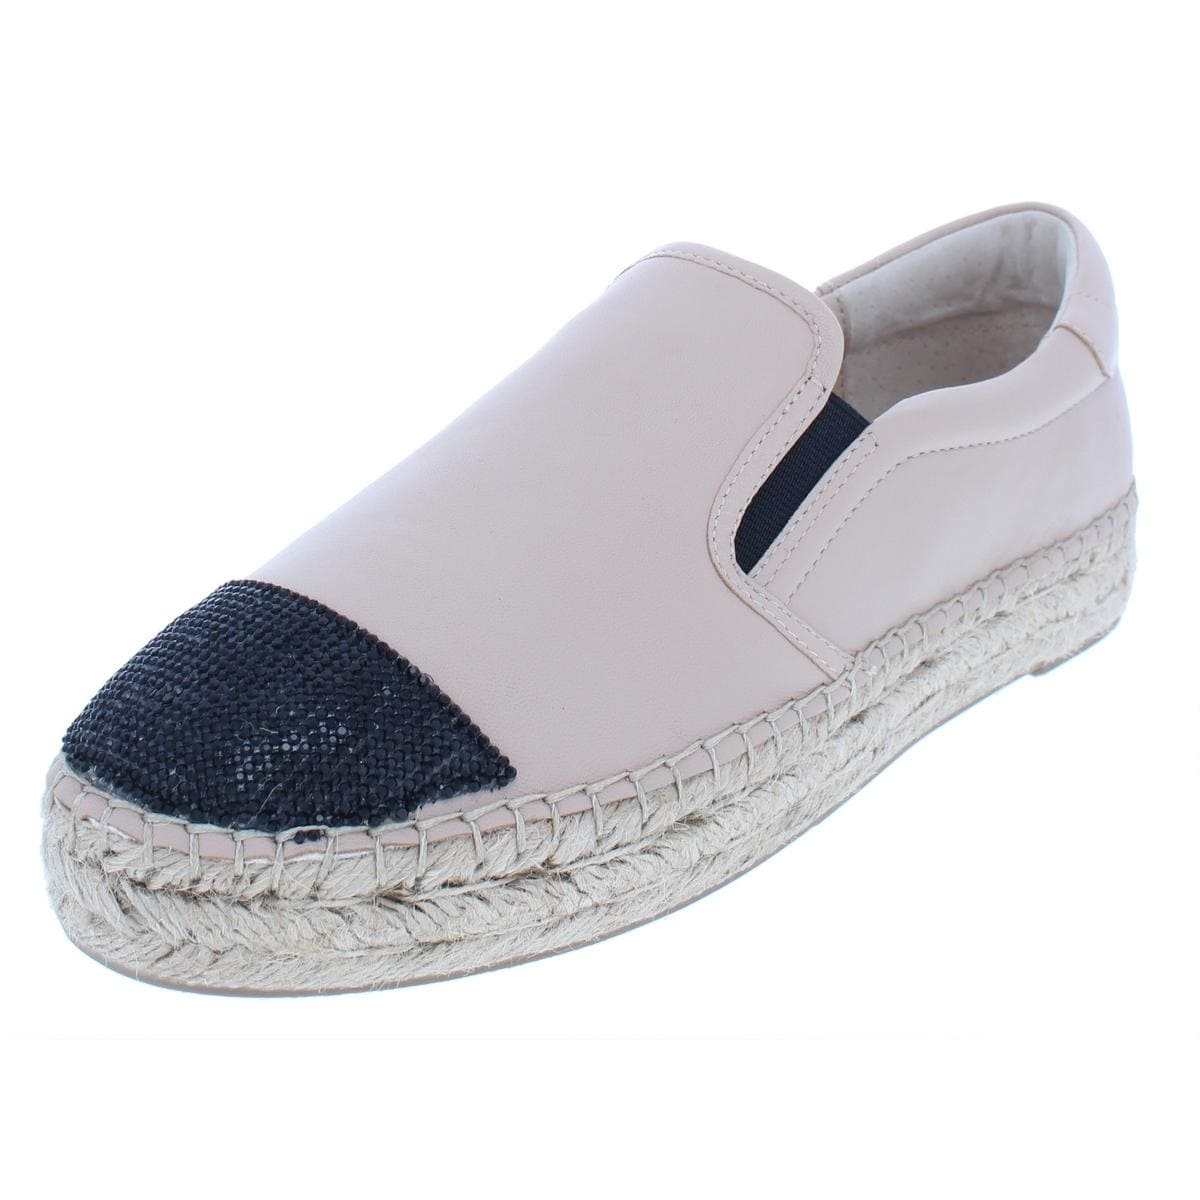 f8daa3e9e993f Shop Kendall + Kylie Womens Joss Loafers Leather Espadrille - Free ...